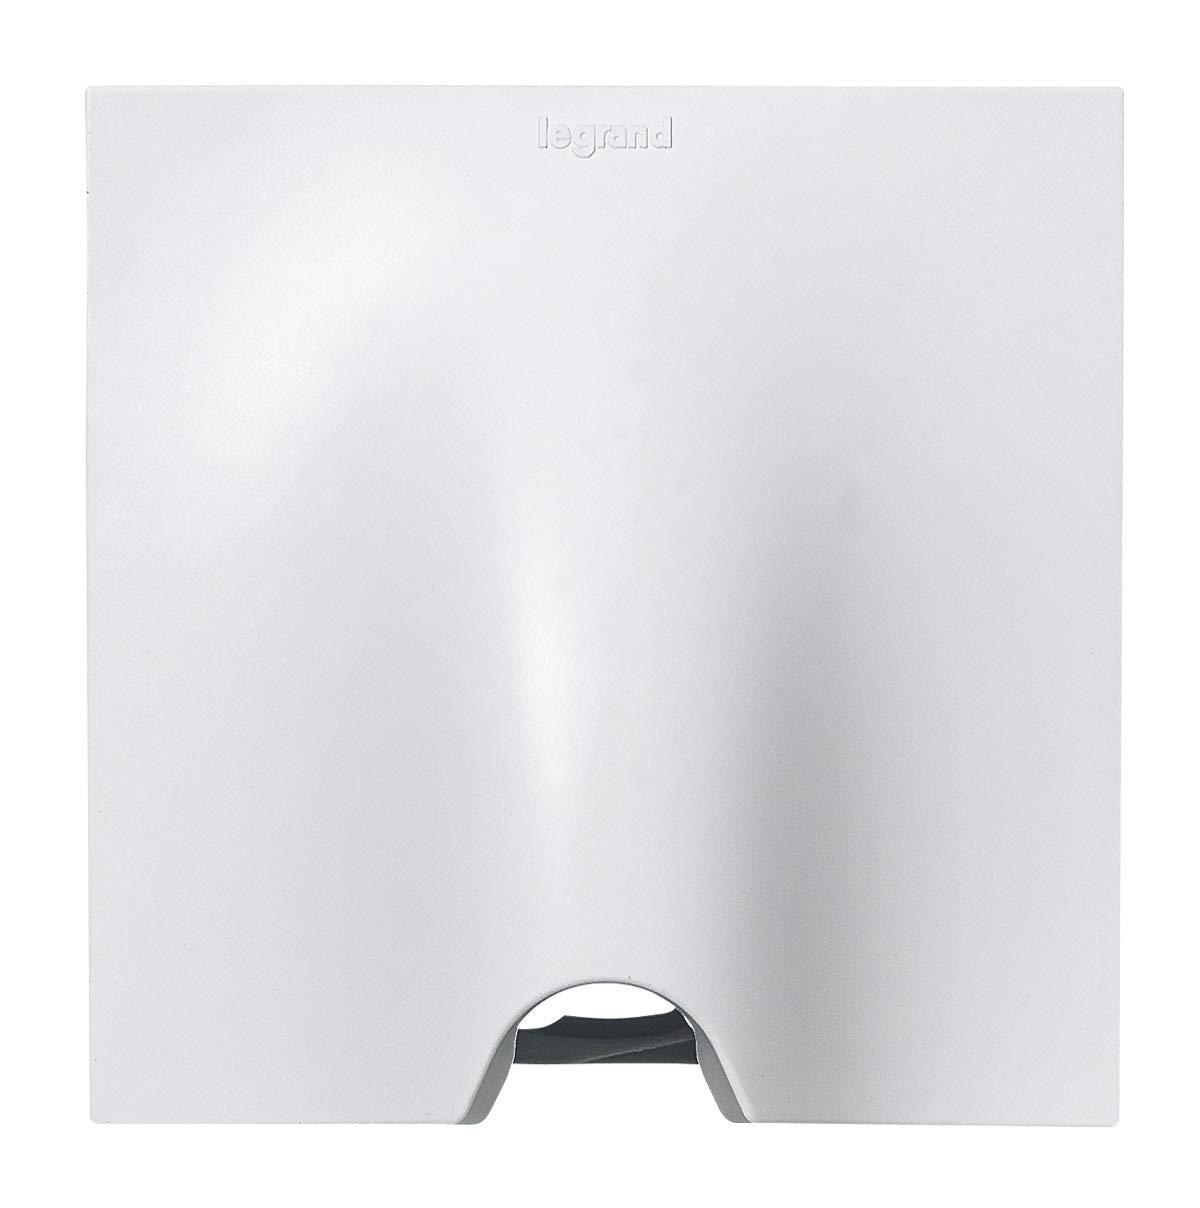 Legrand LEG91339 Neptune Sortie de c/âble Blanc